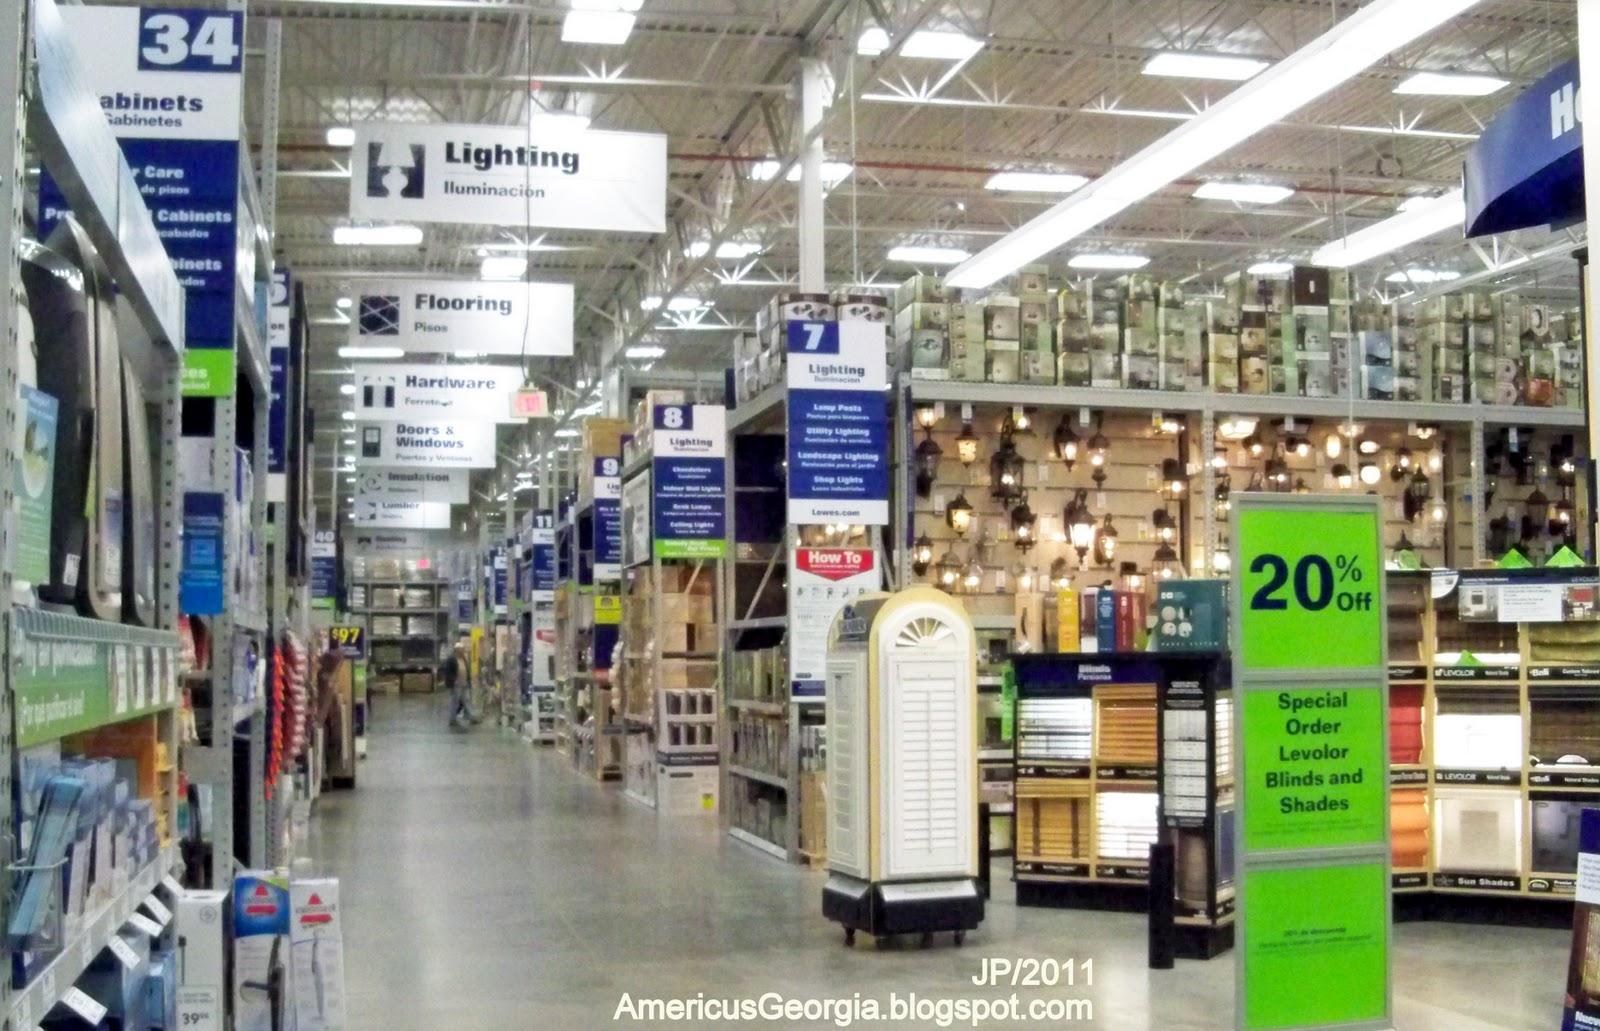 Wood wallpaper lowes free download wallpaper dawallpaperz for Wallpaper lowe s home improvement